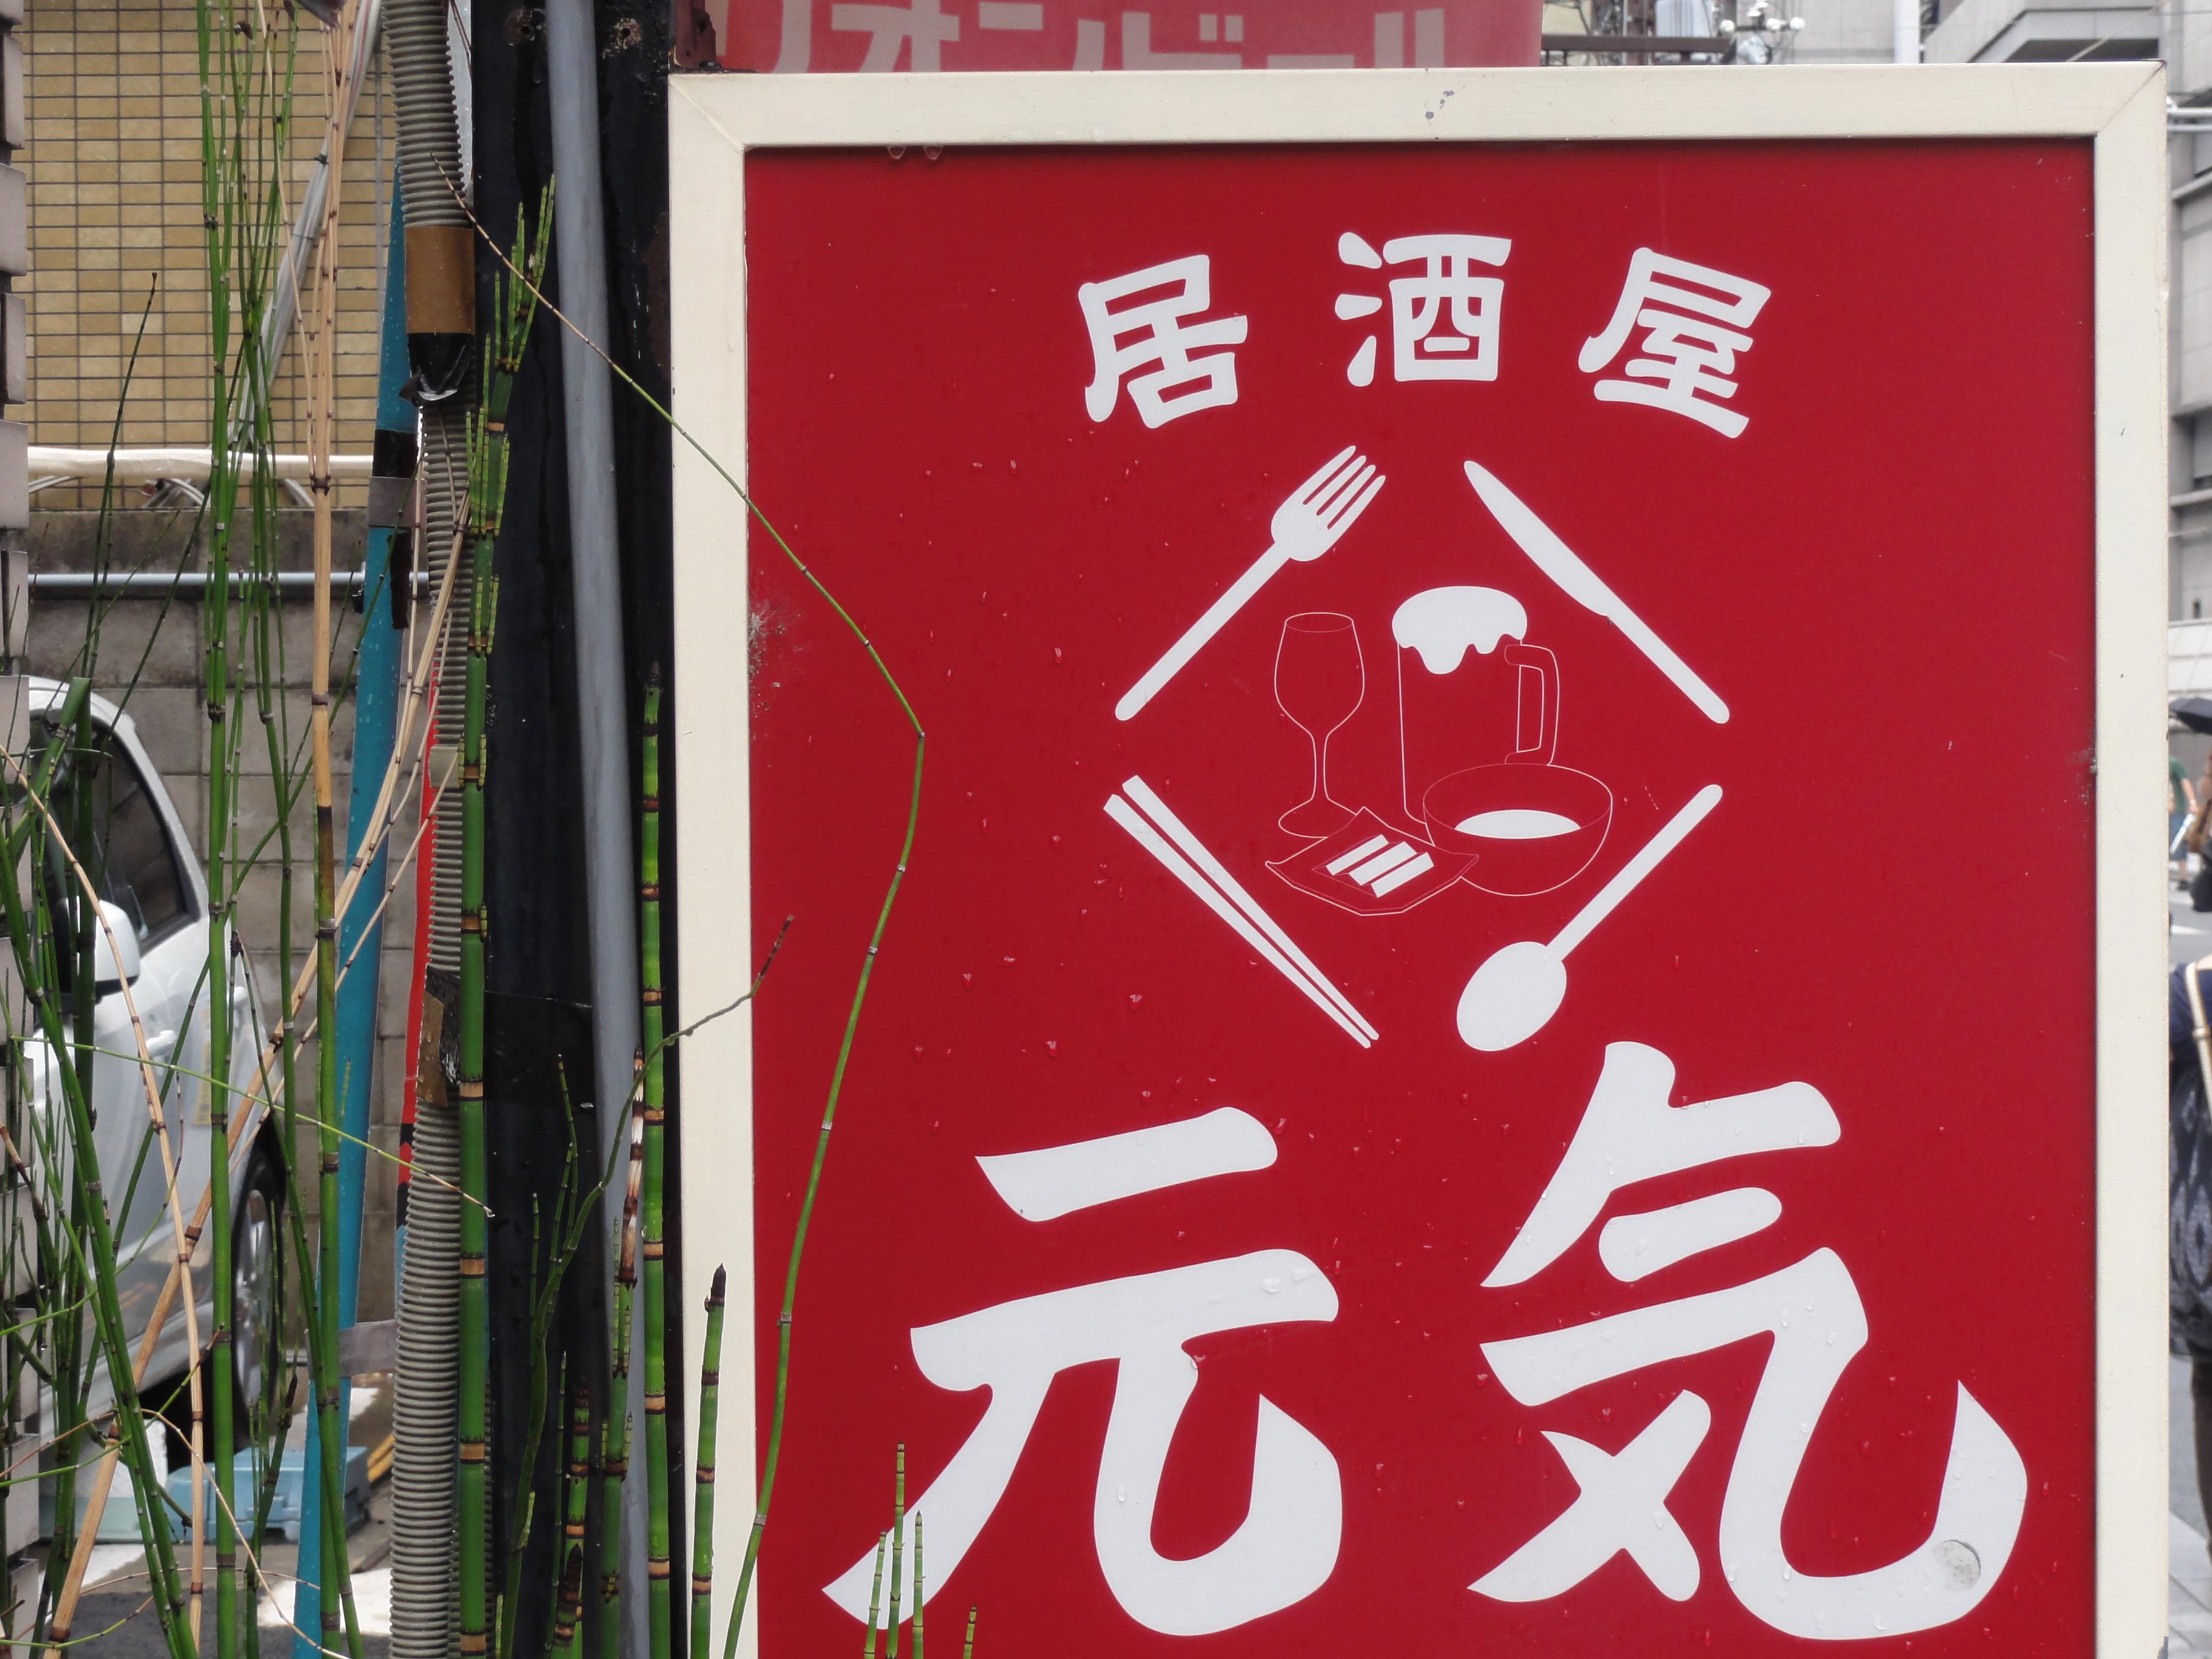 learn-kanji-Japanese-sign-genki-izakaya-252